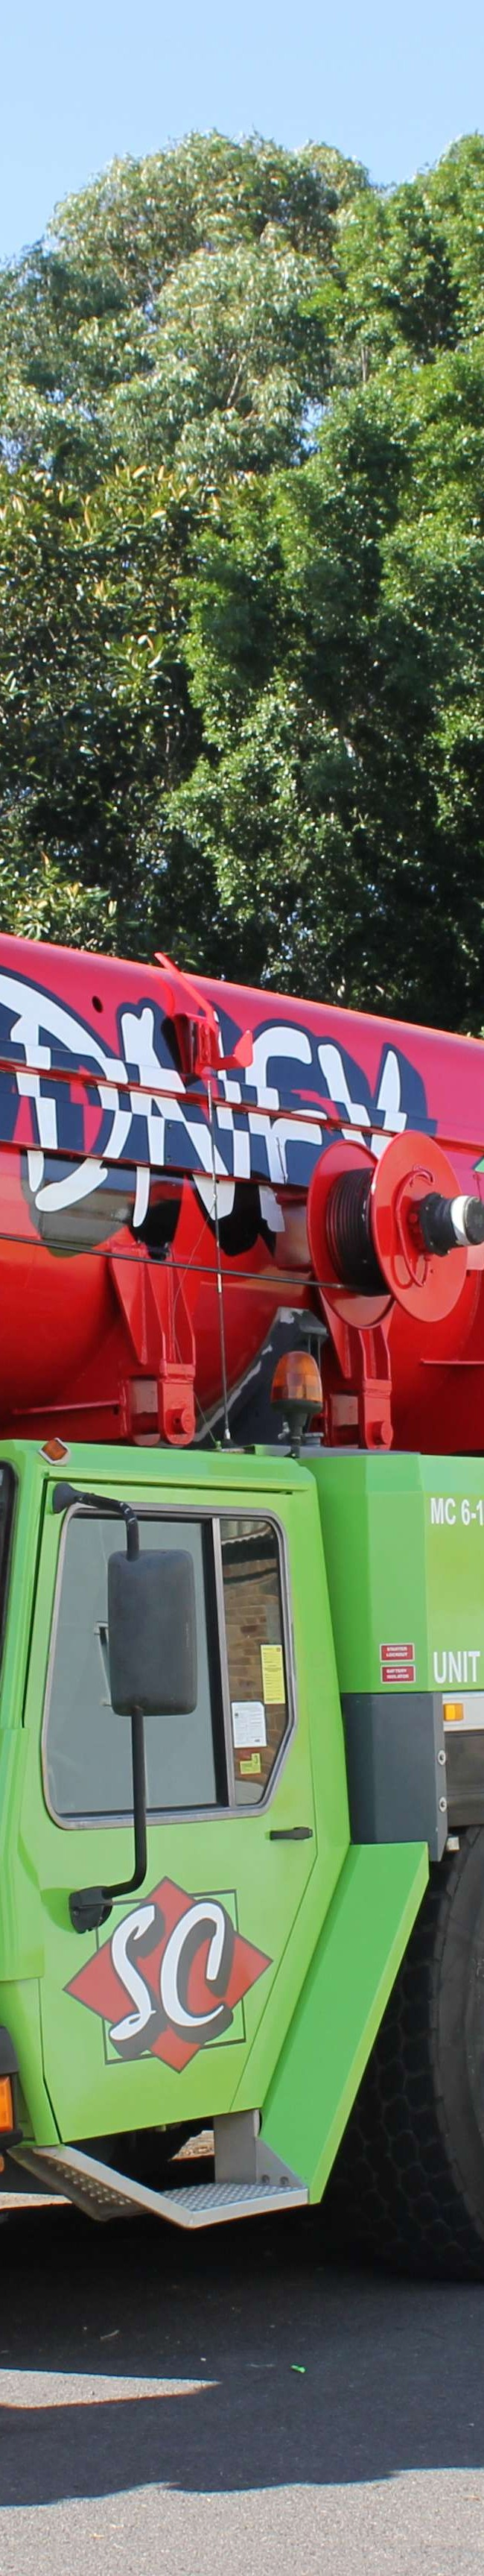 Sydney Cranes 'The Hulk'